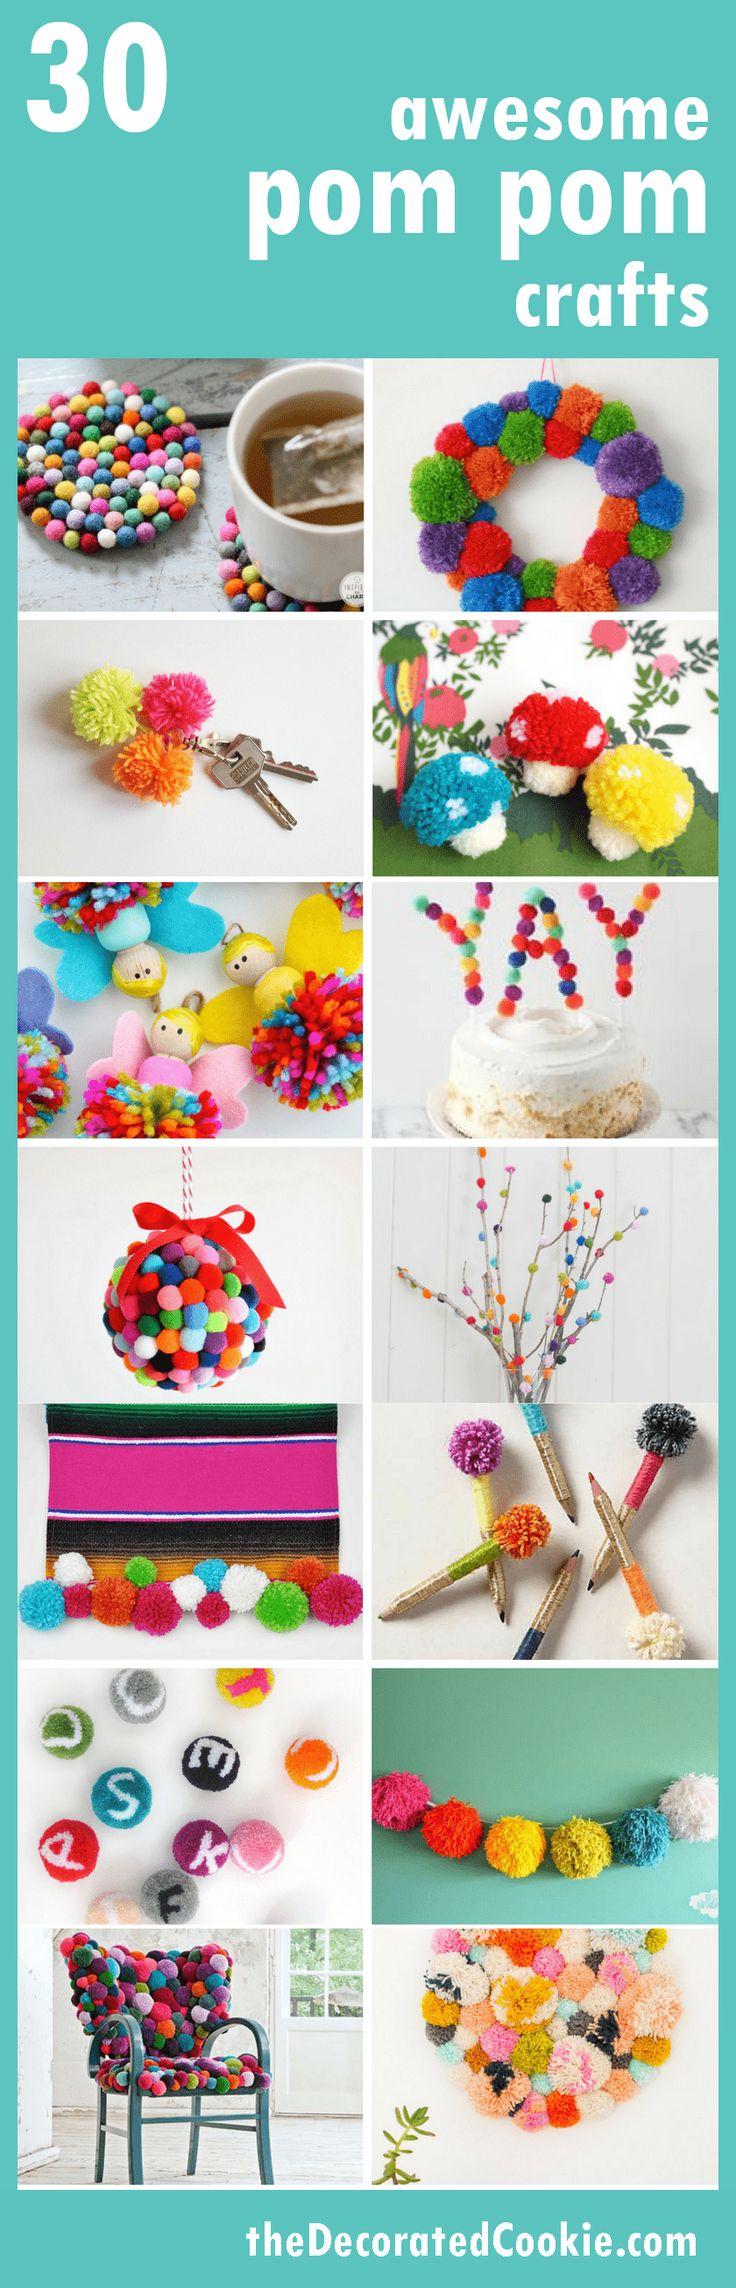 a roundup of 30 awesome POM POM crafts